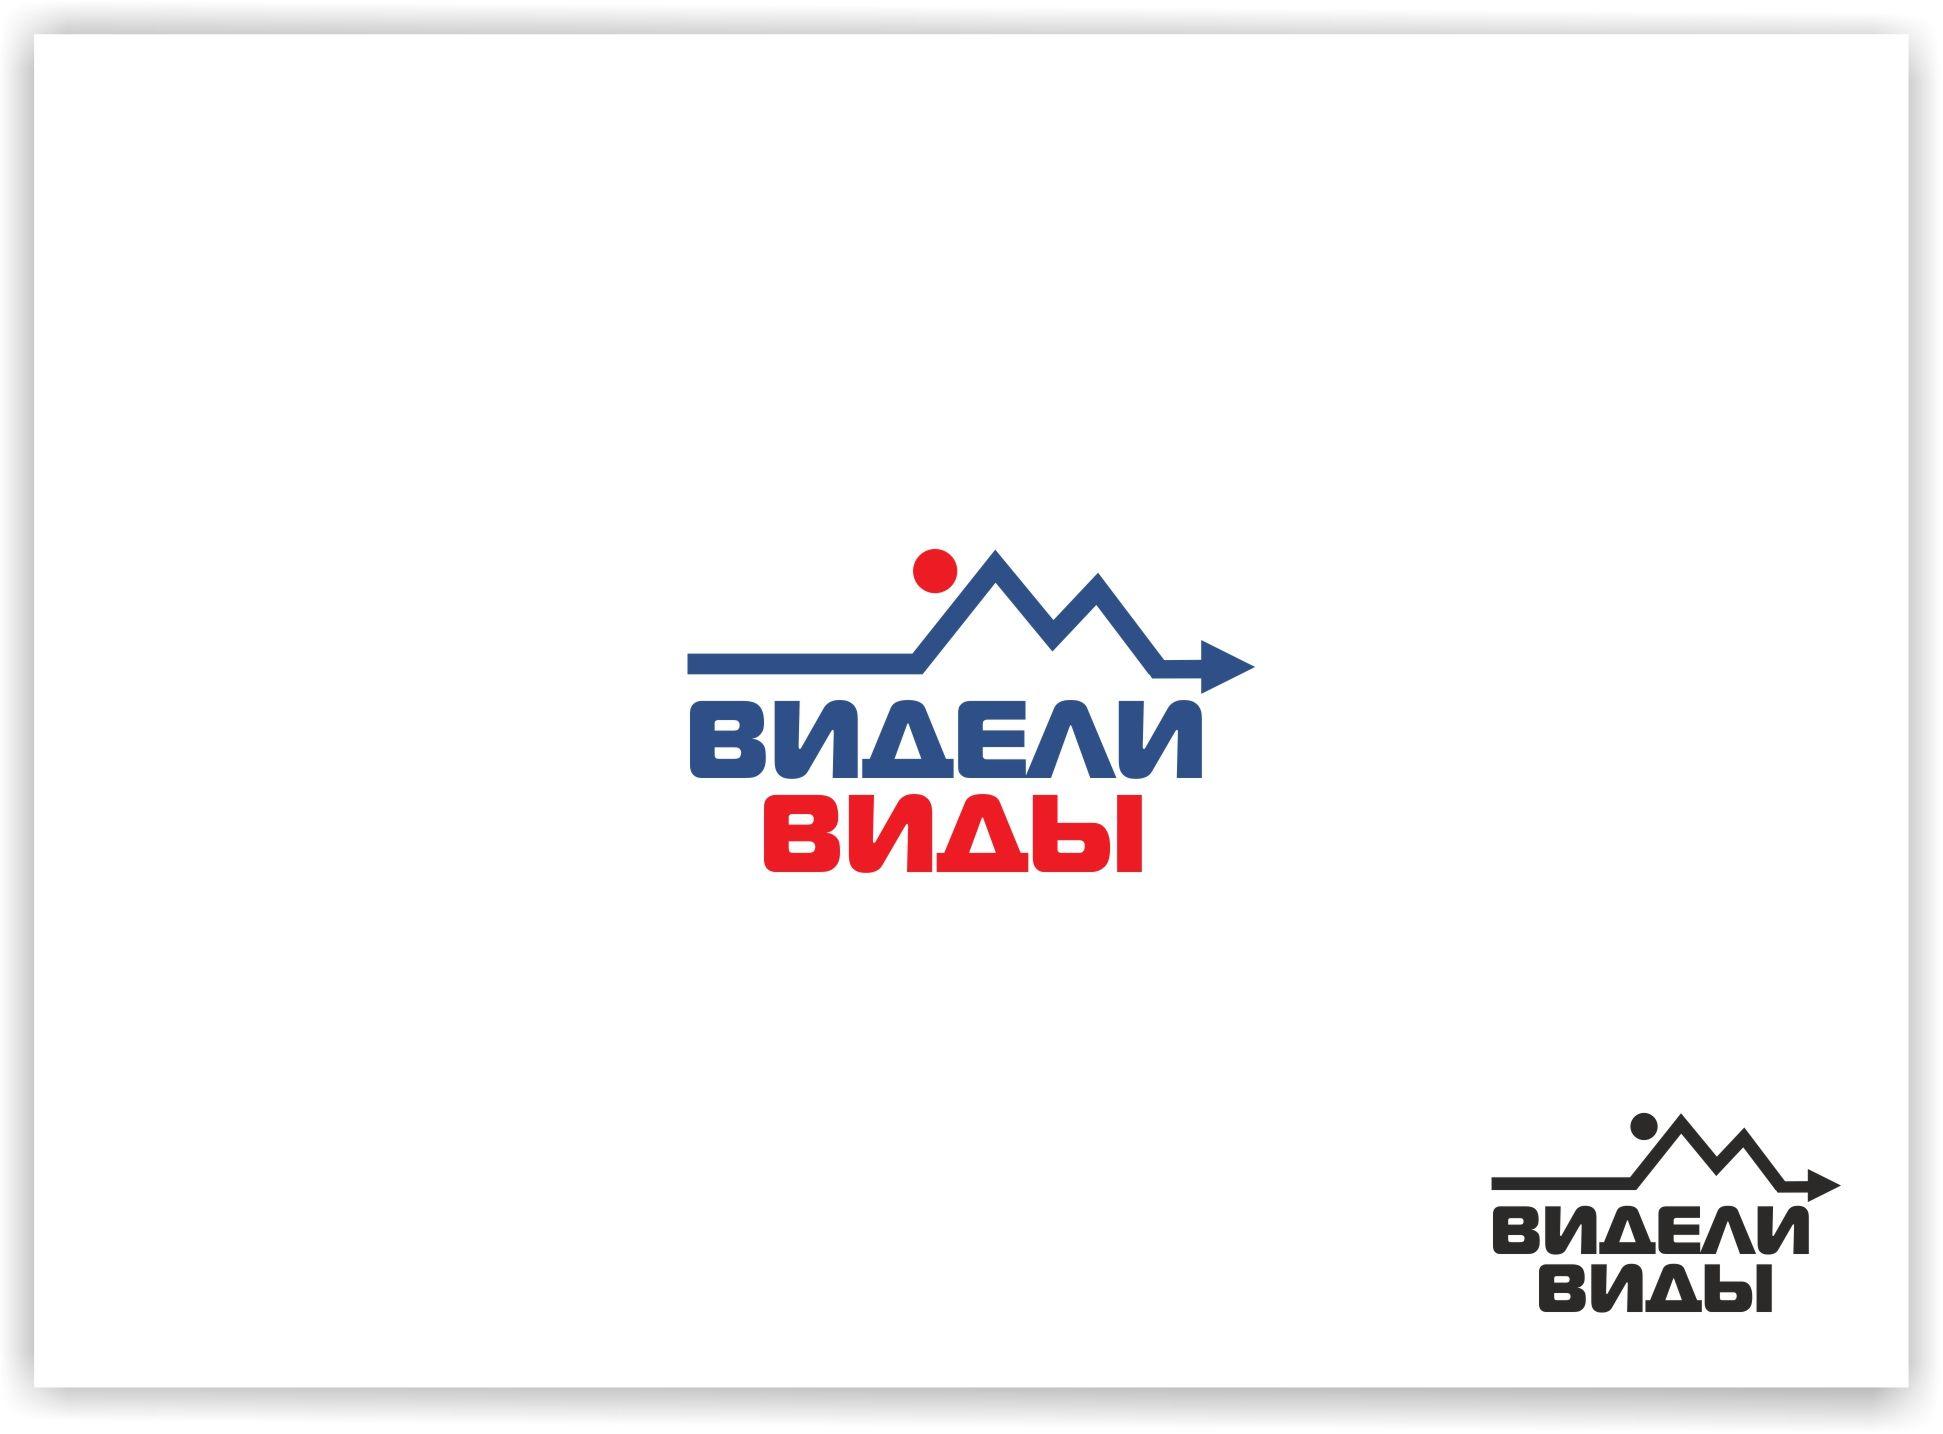 Логотип для Видели Виды - дизайнер malito